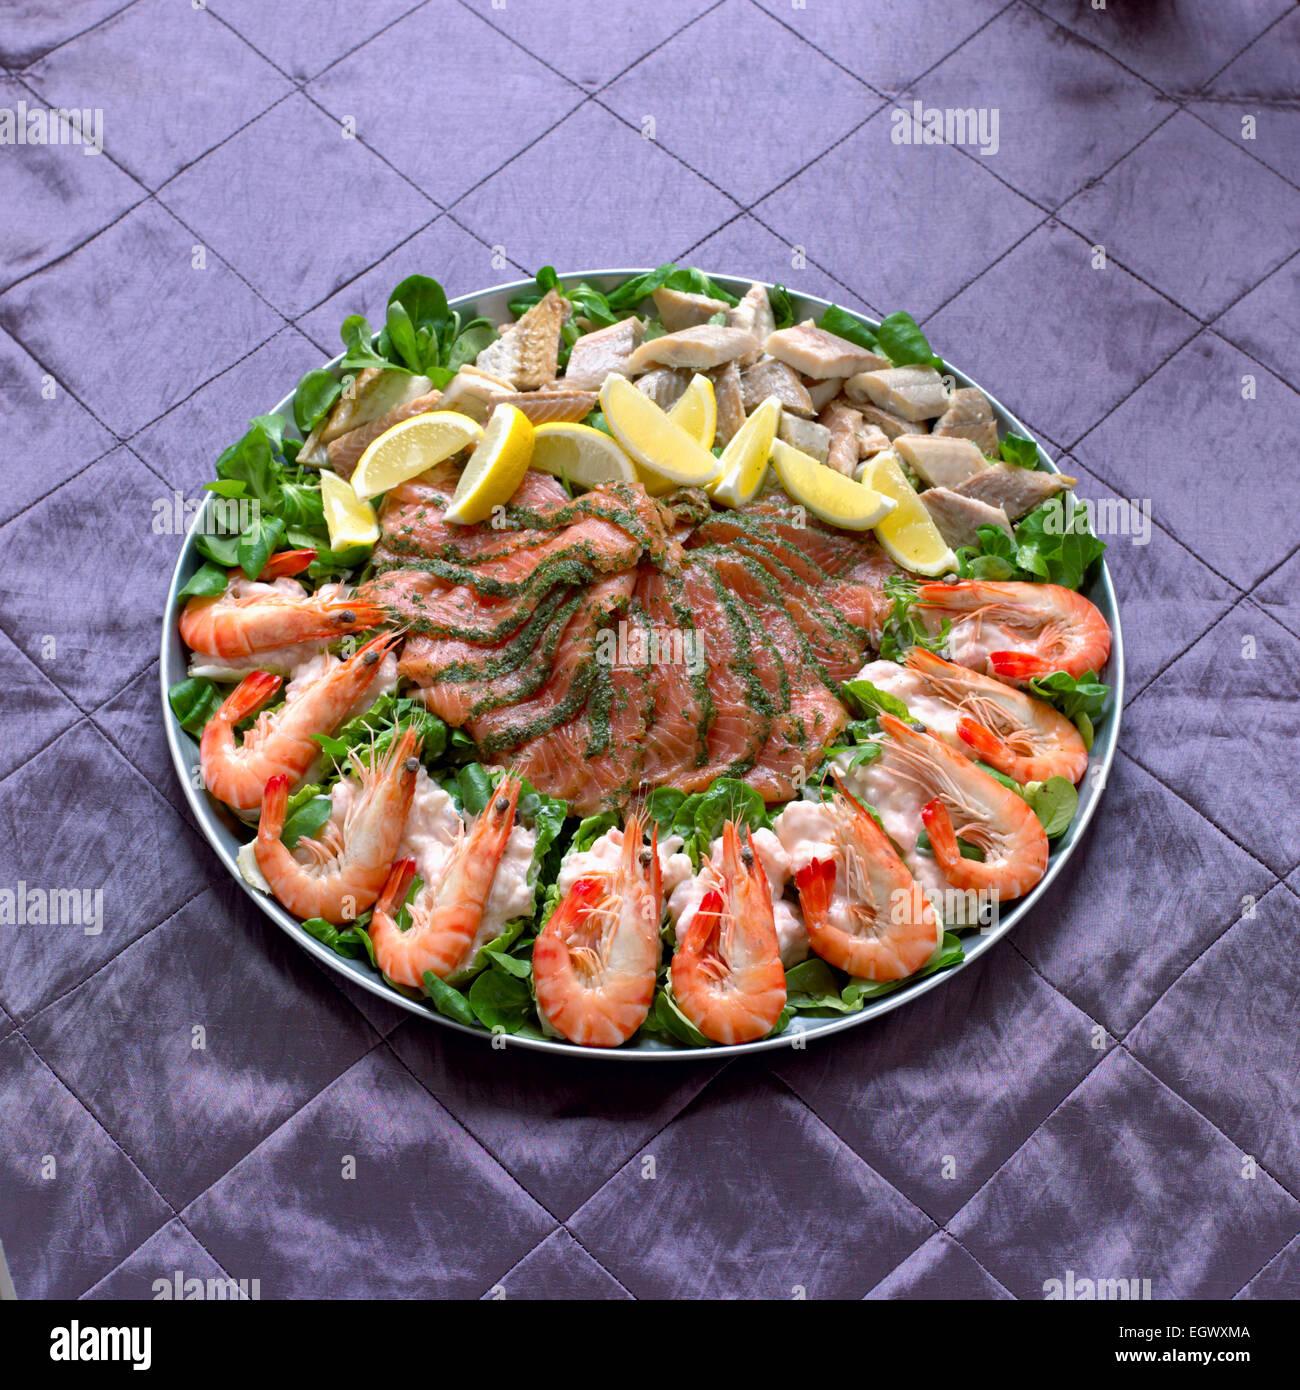 Fish And Seafood Platter Including Gravadlax Salmon Prawn Stock Photo Alamy